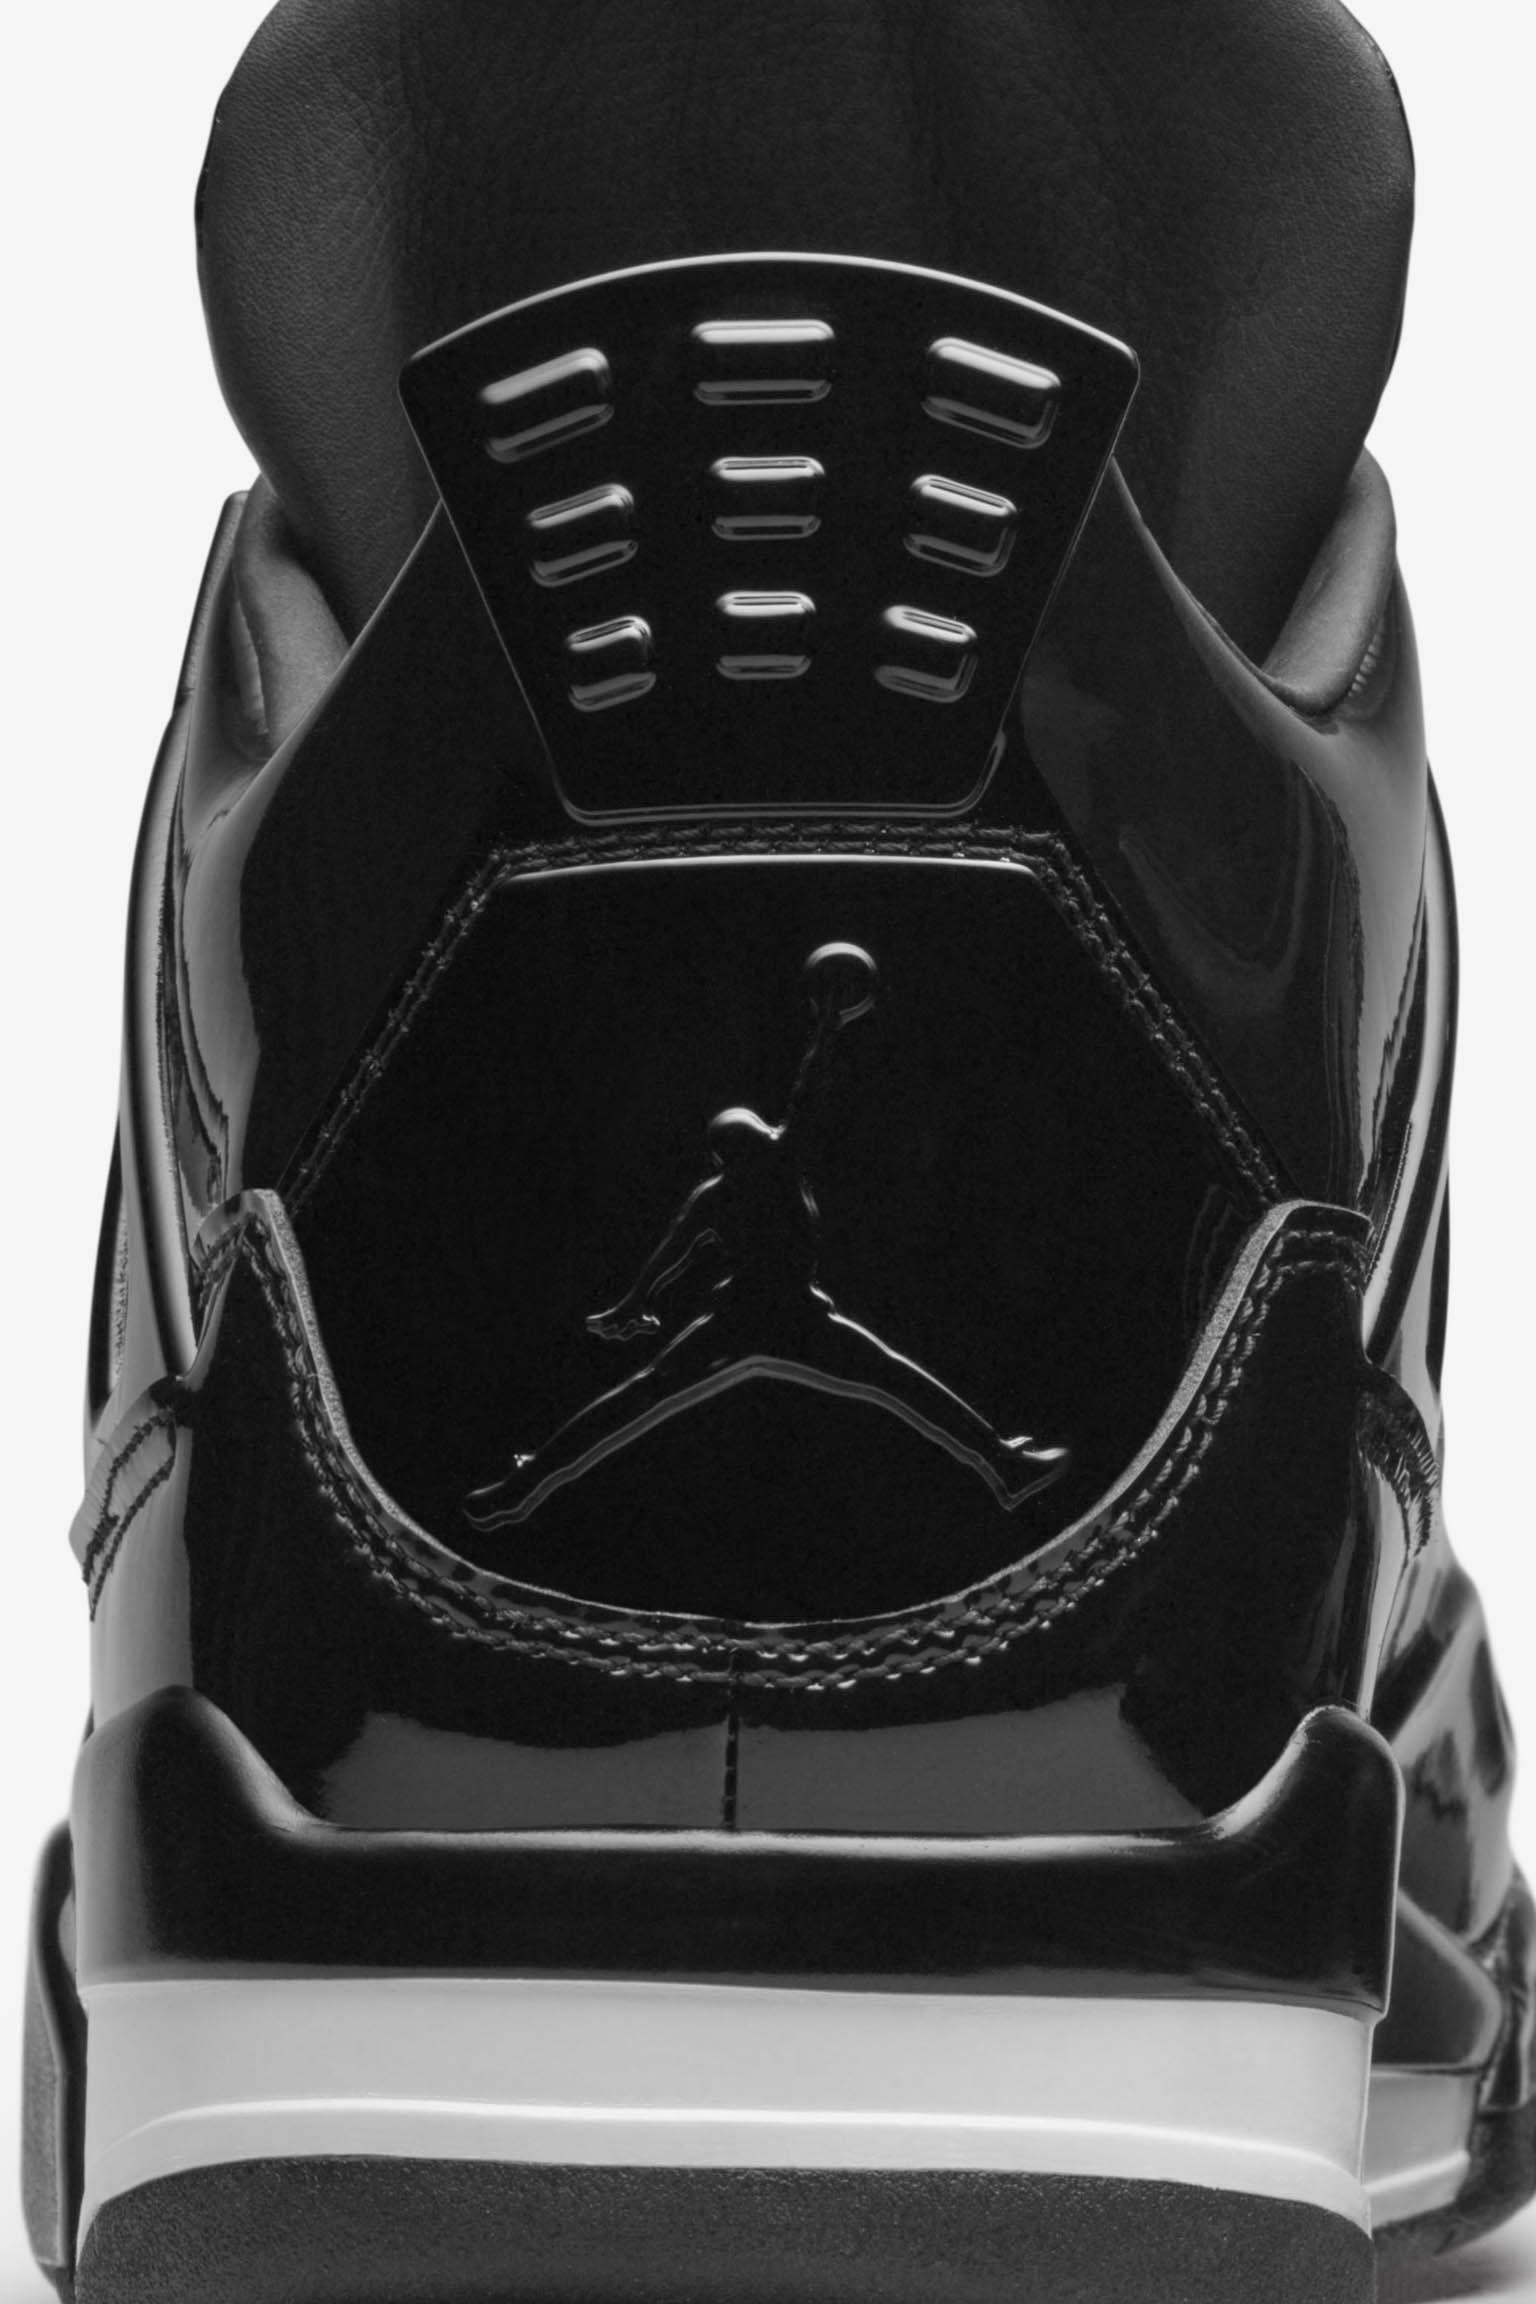 Air Jordan 11LAB4  Black Patent  Release Date. Nike+ SNKRS e63c0adbc1